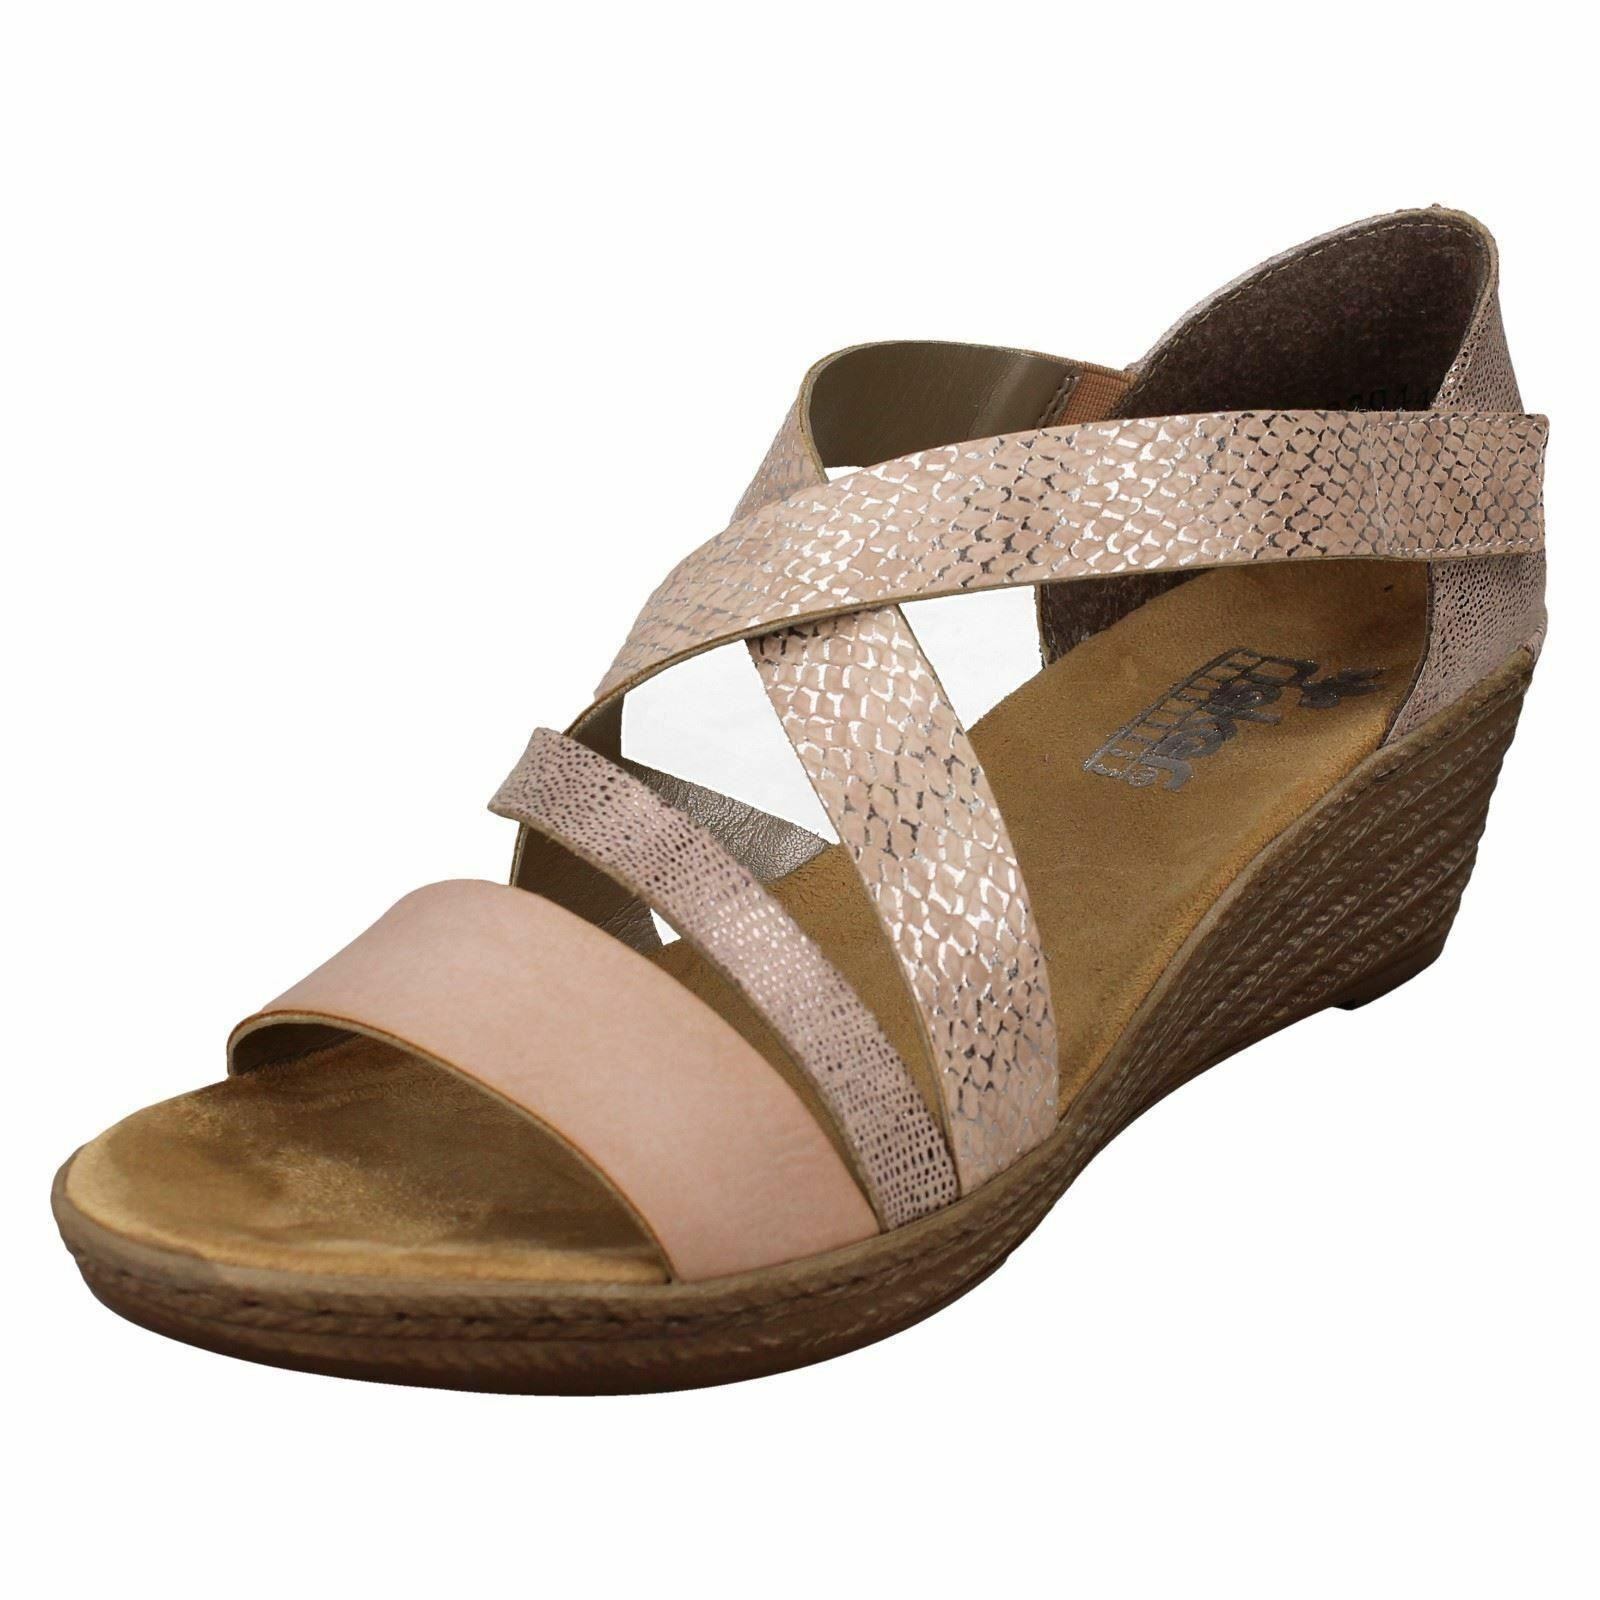 V5373 Ladies Rieker Summer Toe Post Sandals